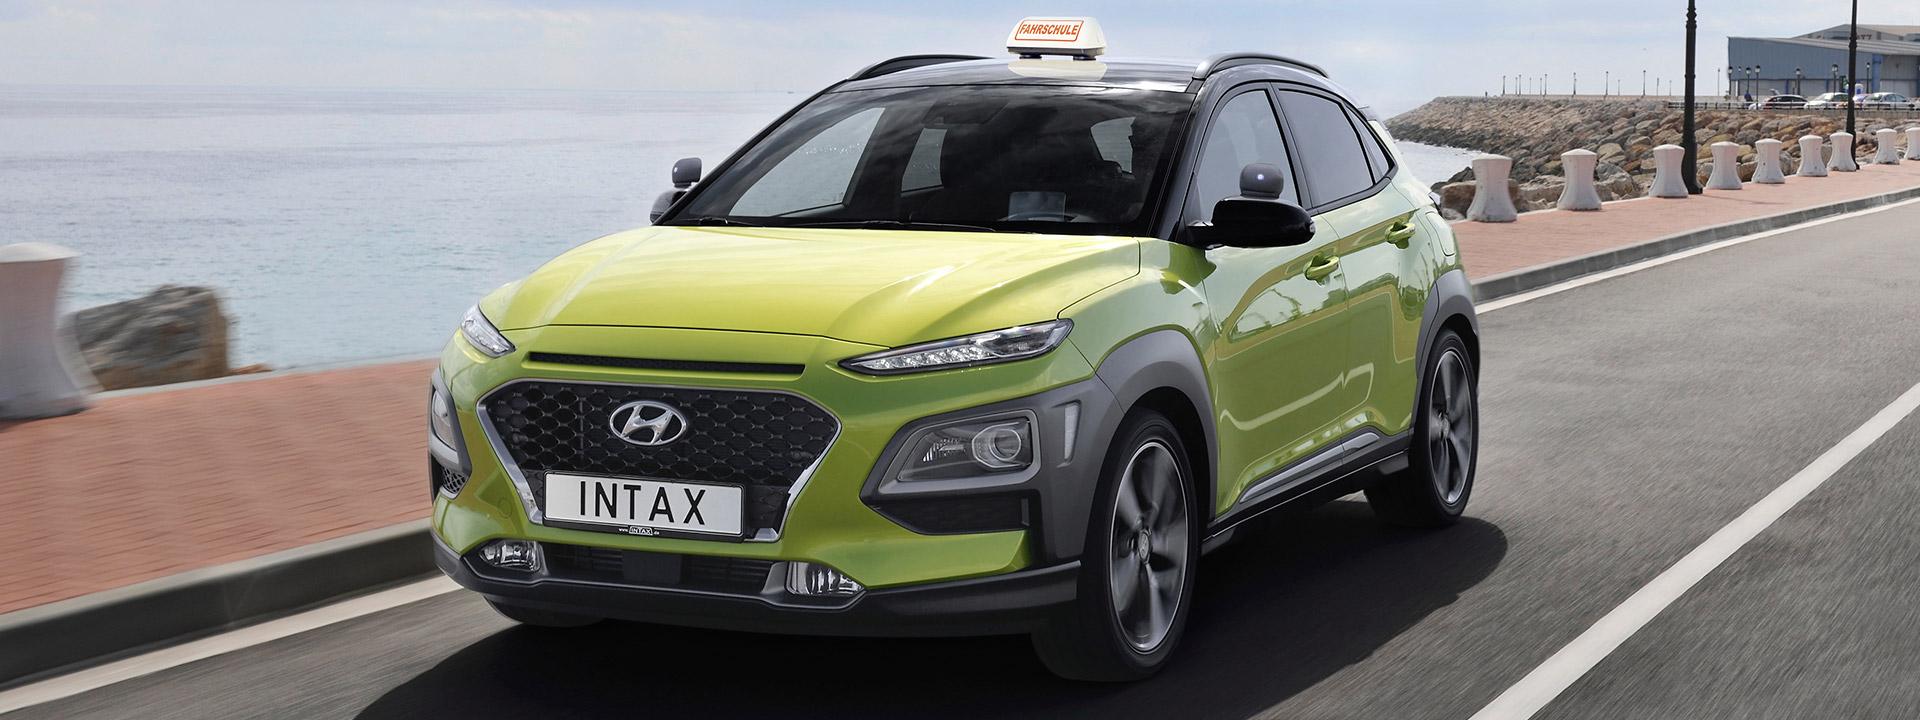 Hyundai Kona als Fahrschulauto